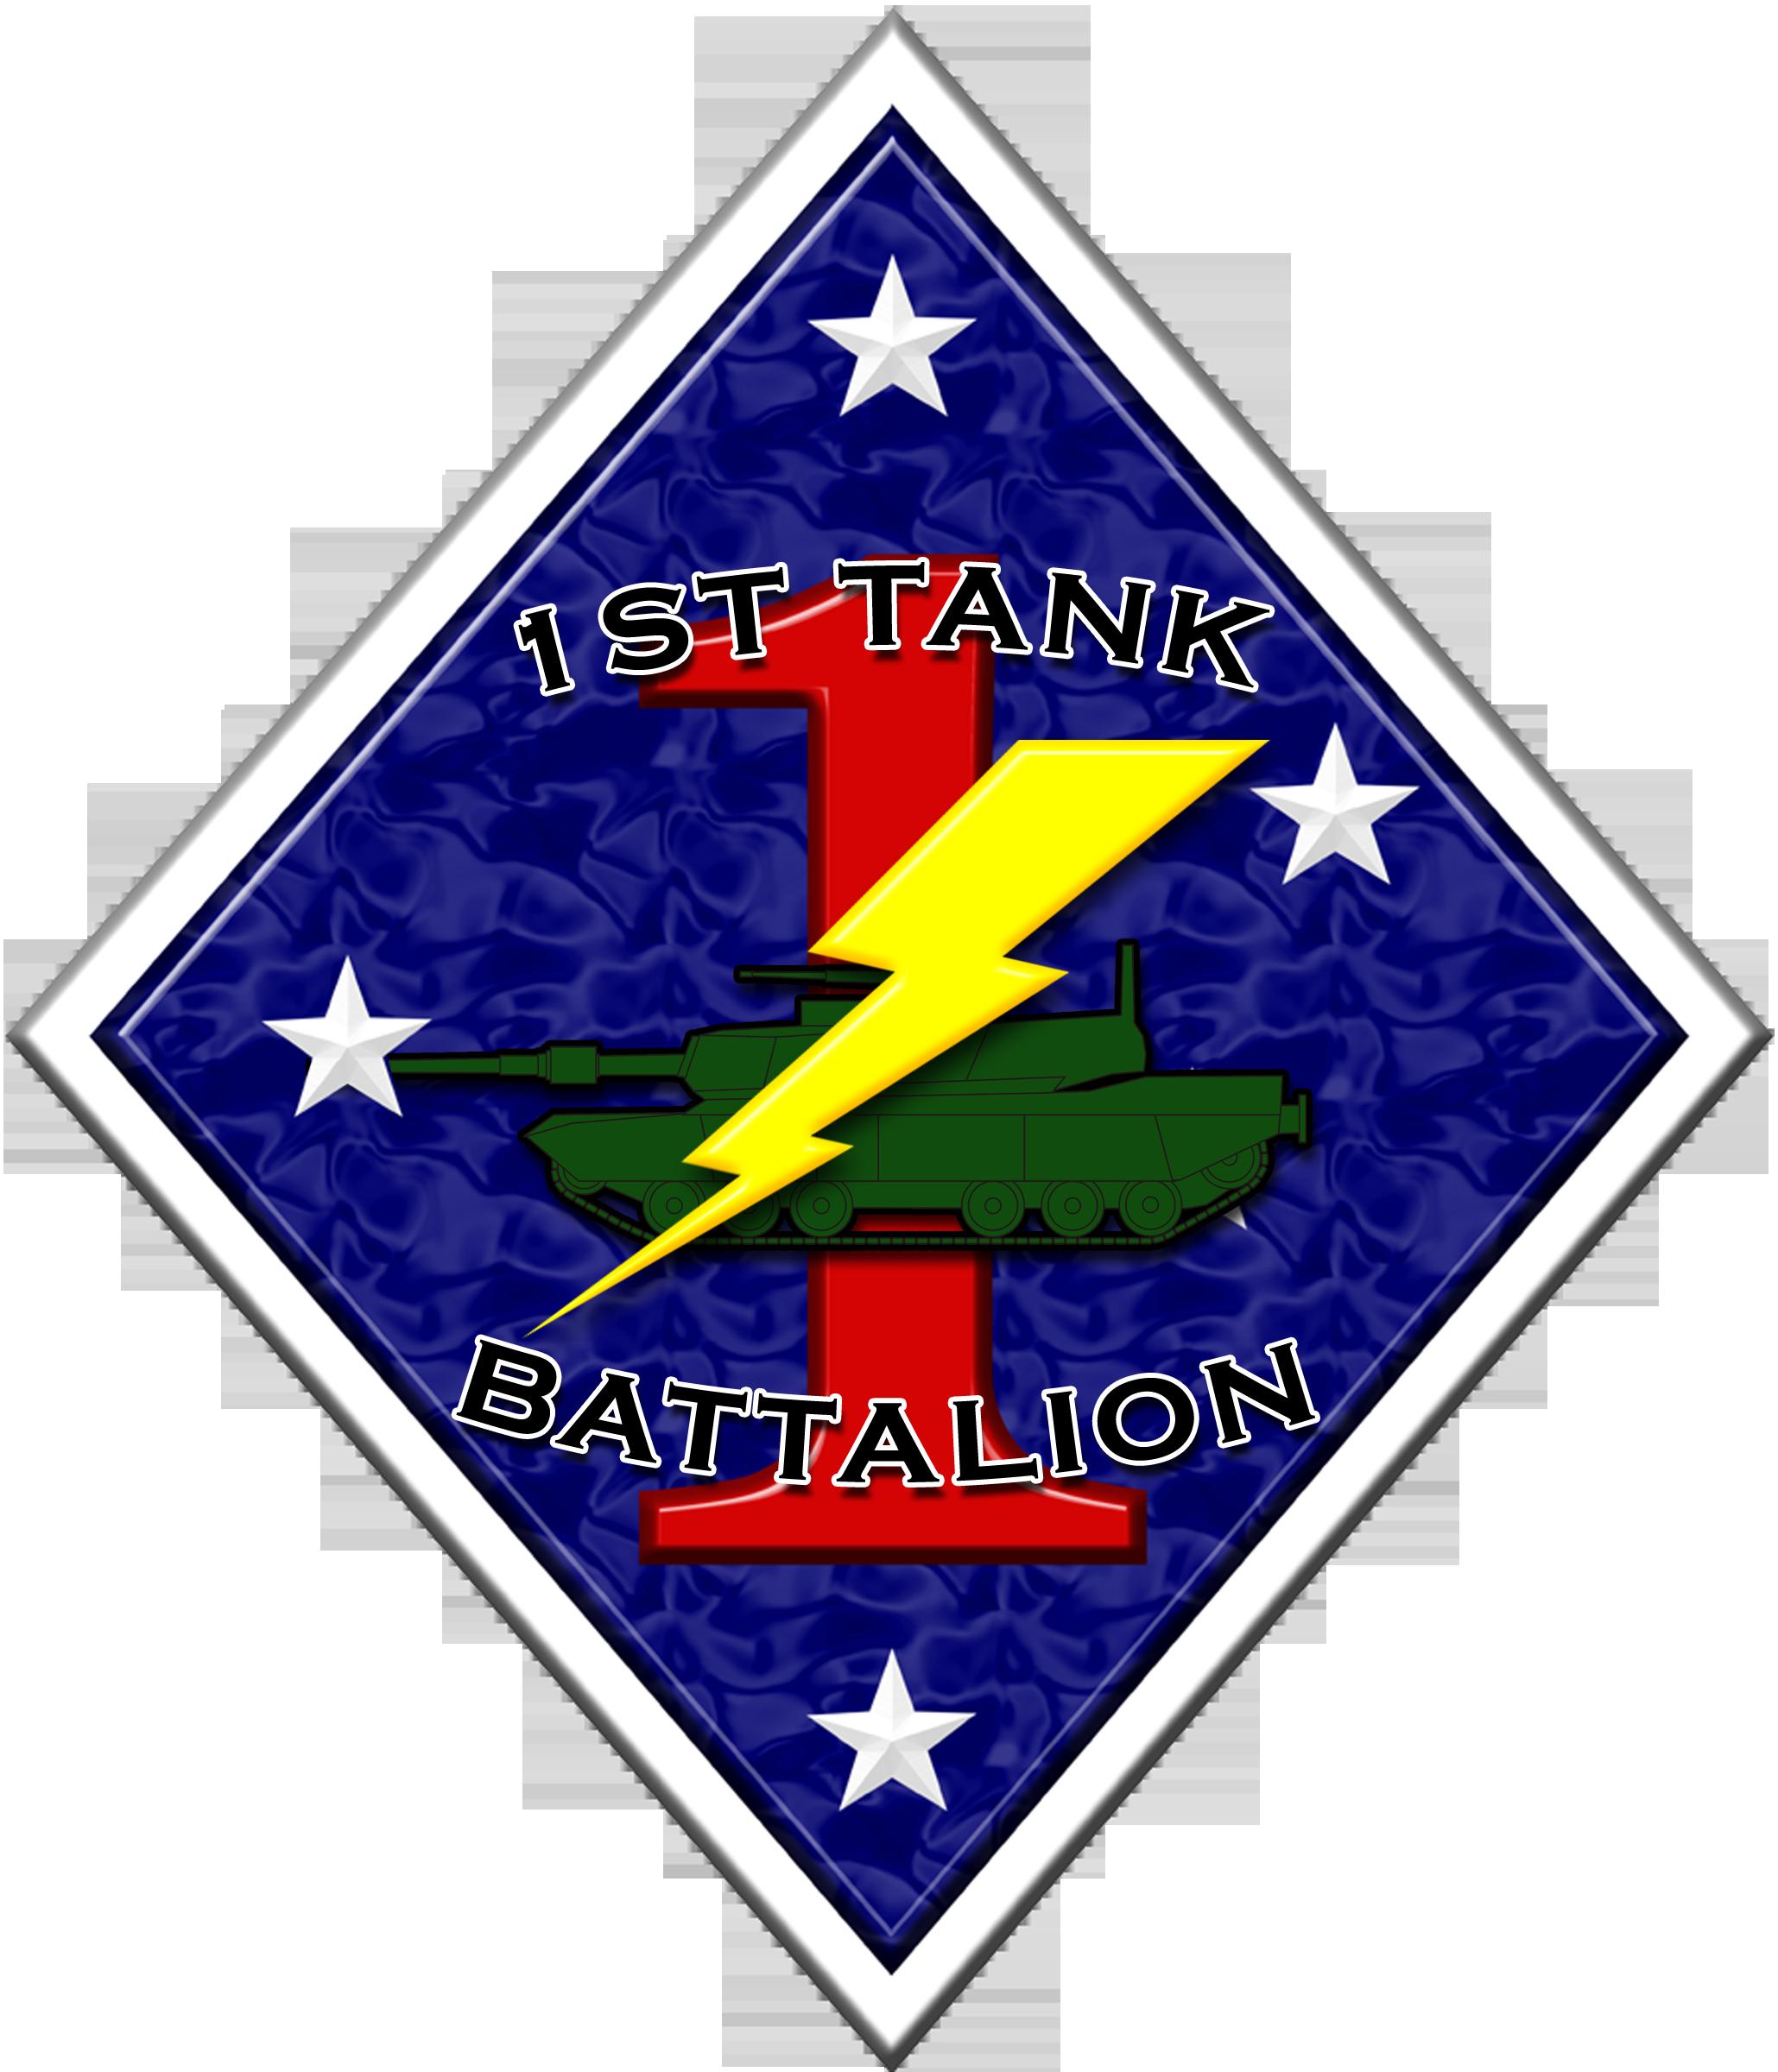 File:1Bn-4thMar logo.svg - Wikipedia  |1st Battalion 4th Marines Logo